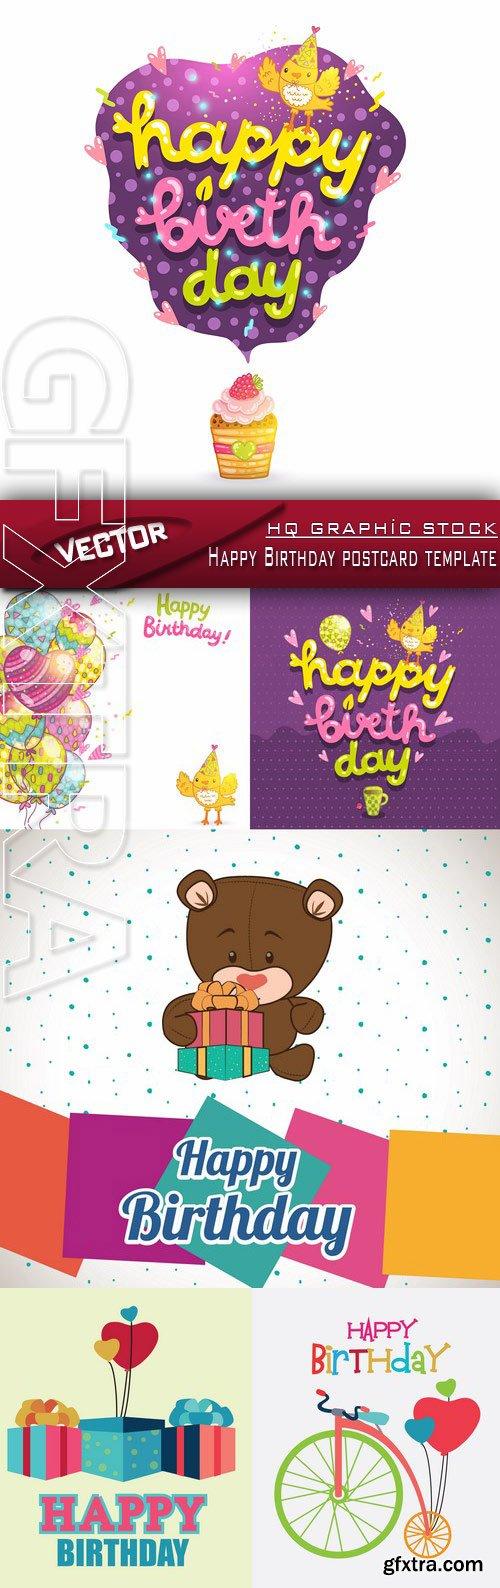 Stock Vector - Happy Birthday postcard template